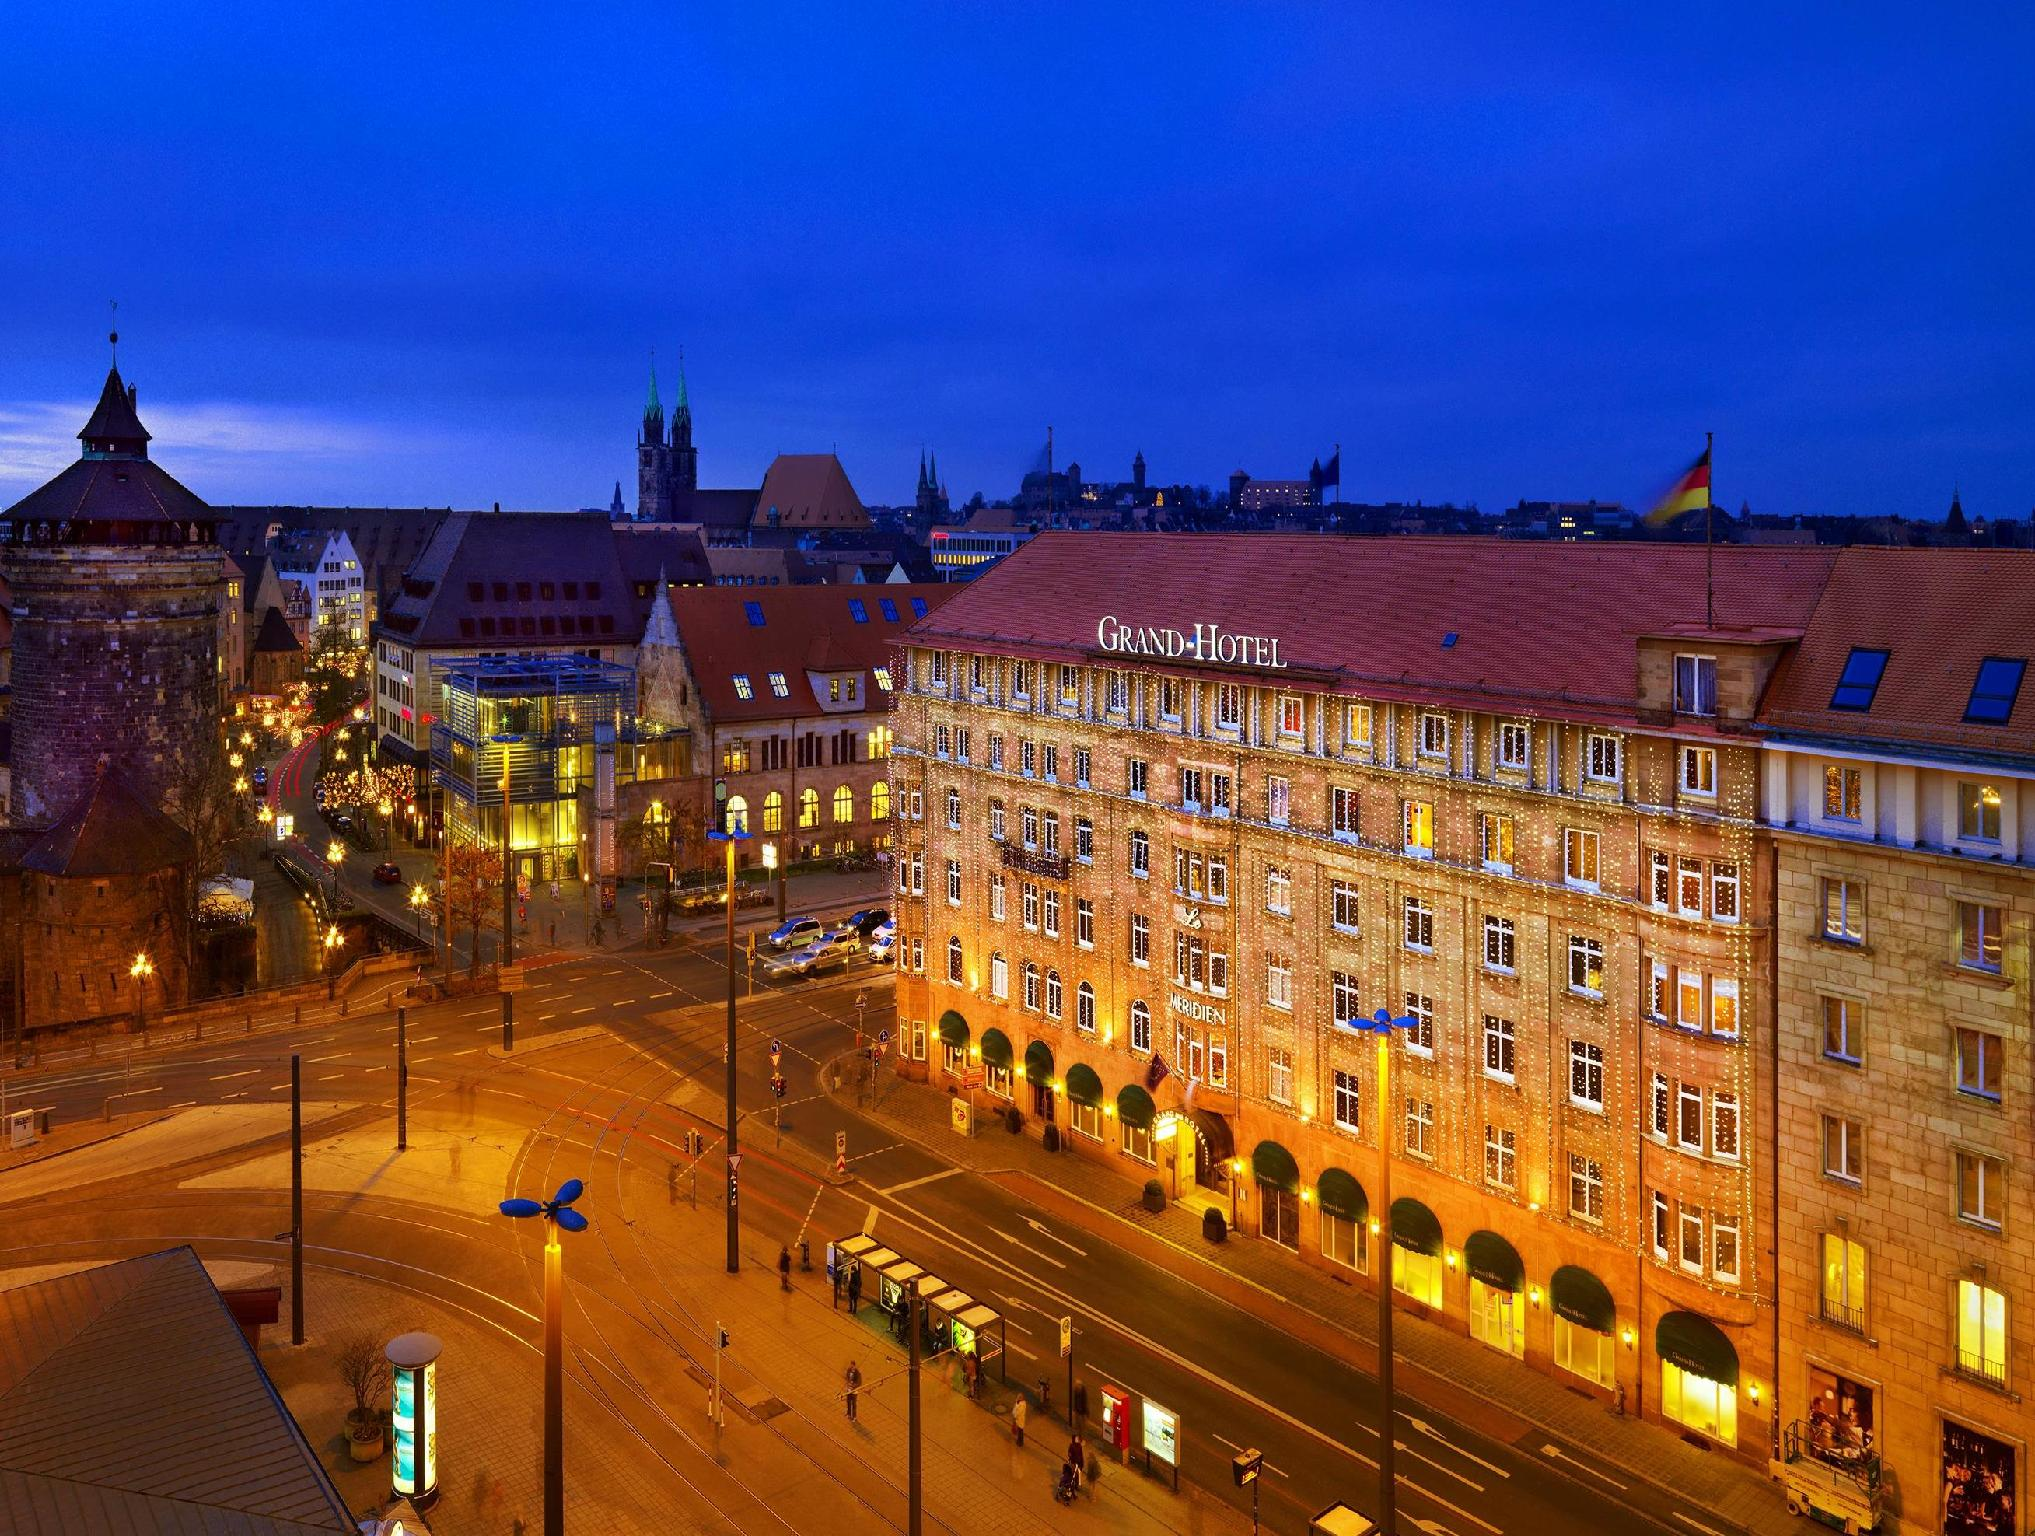 Le M�ridien Grand Hotel Nuremberg